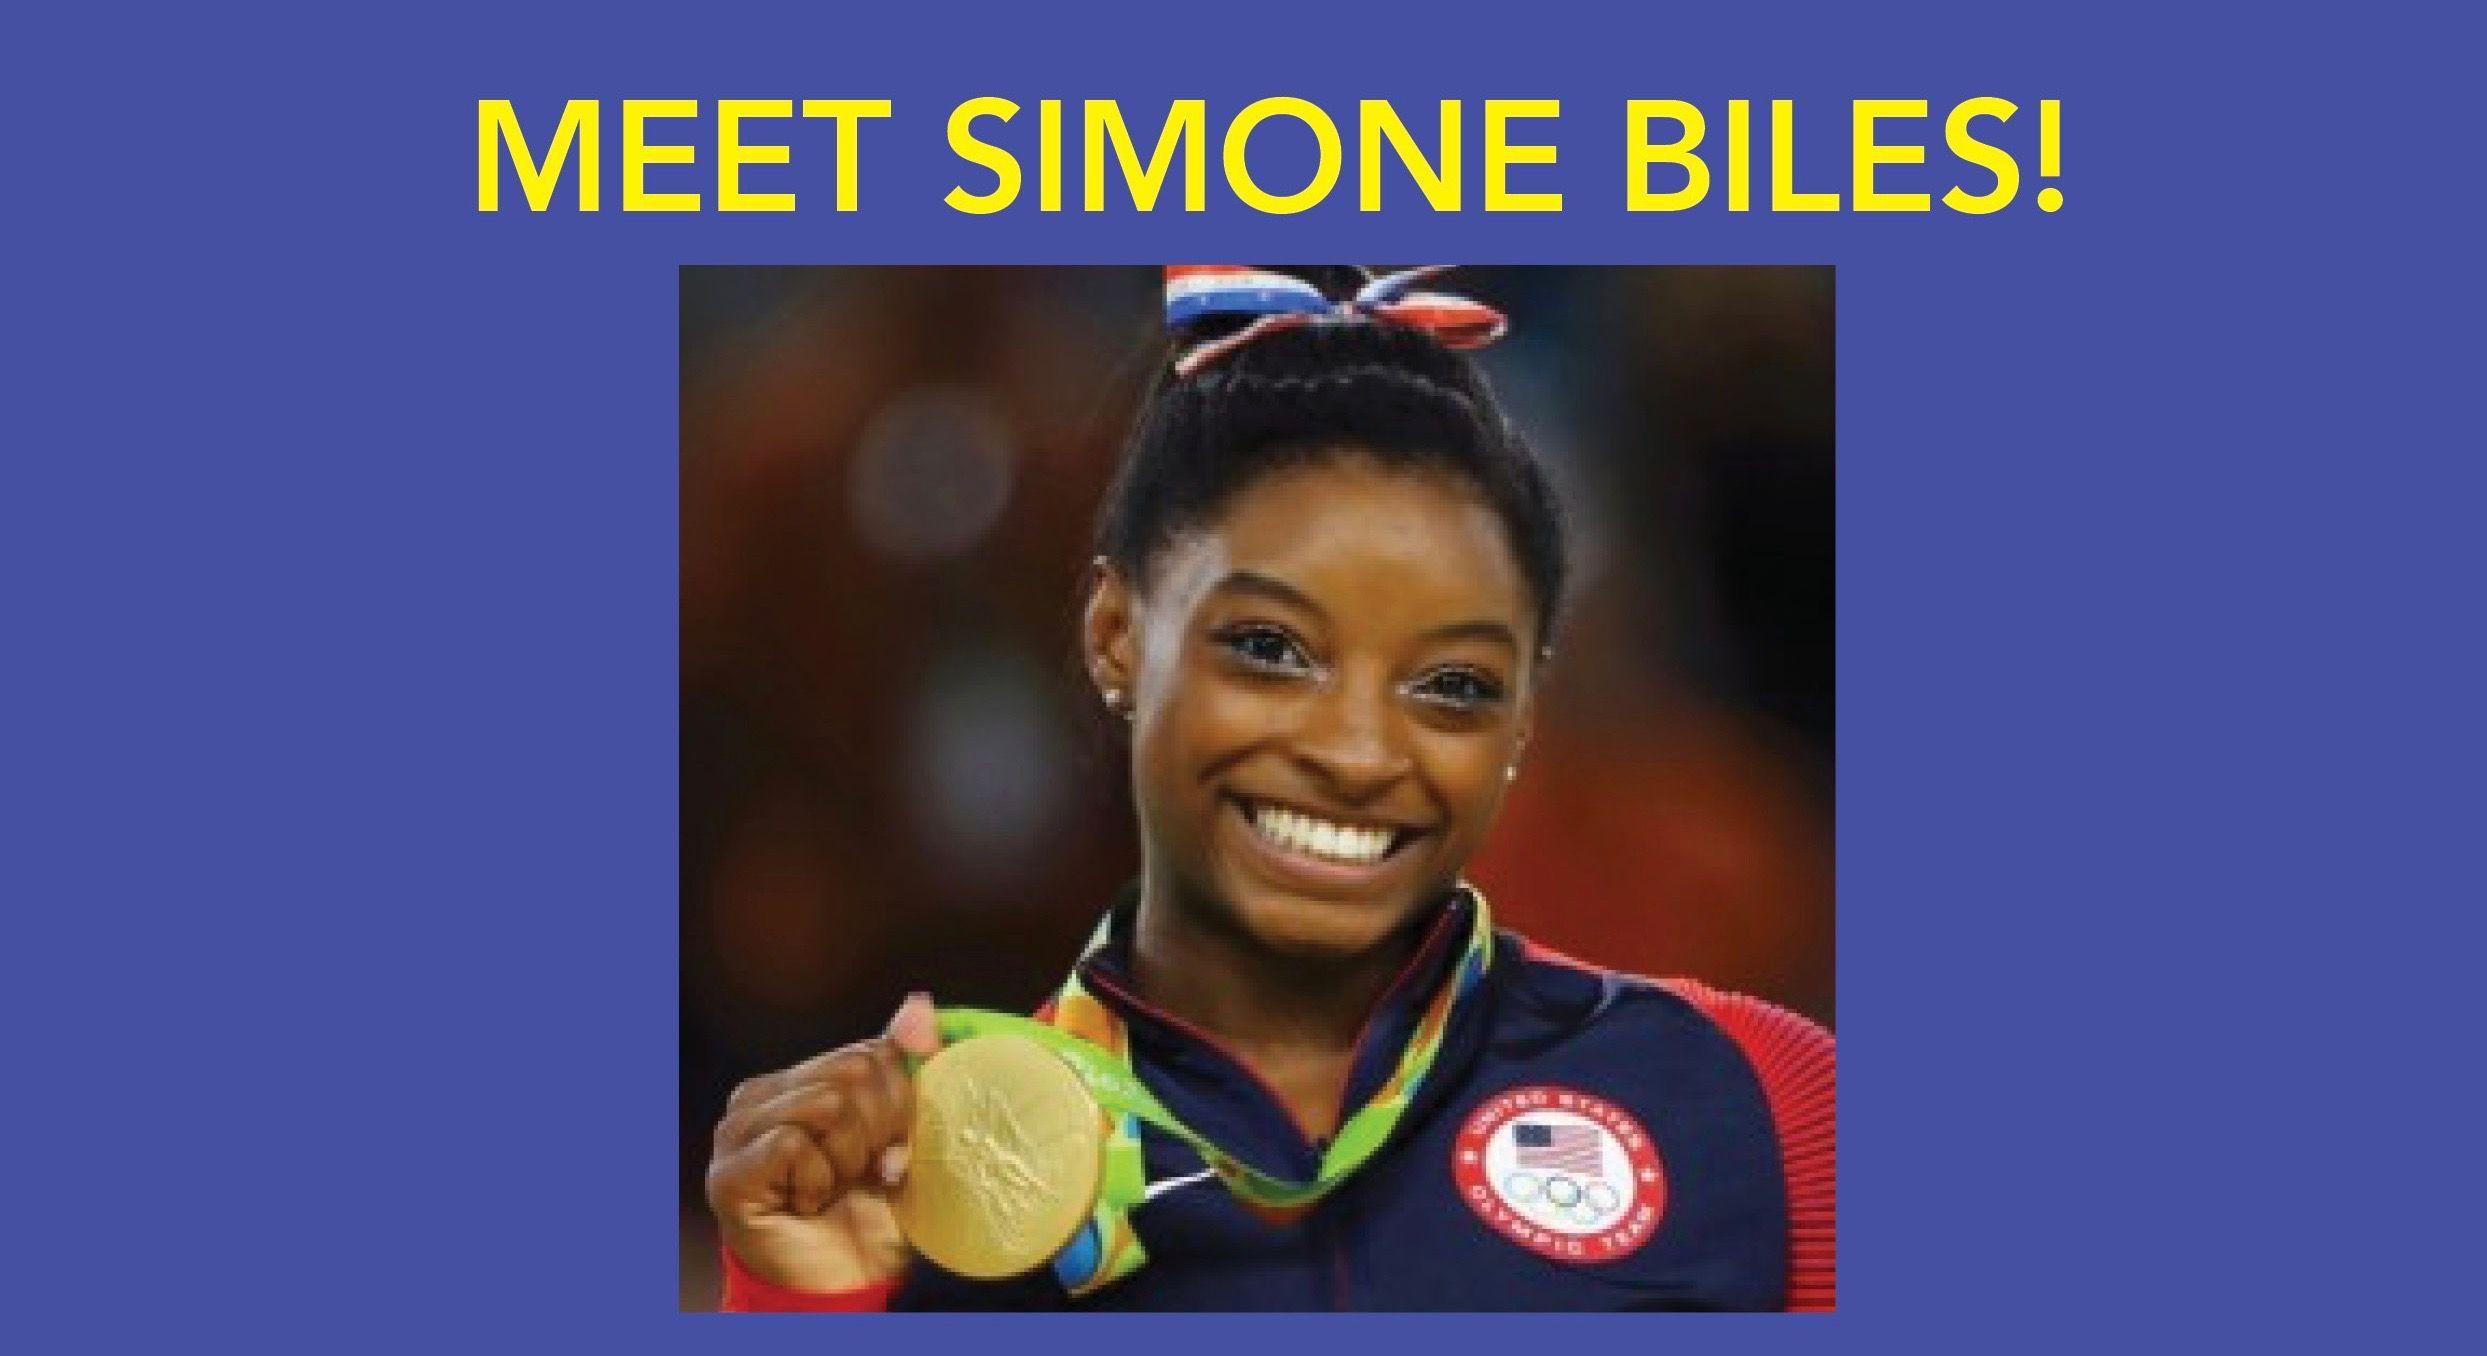 Meet Simone Biles